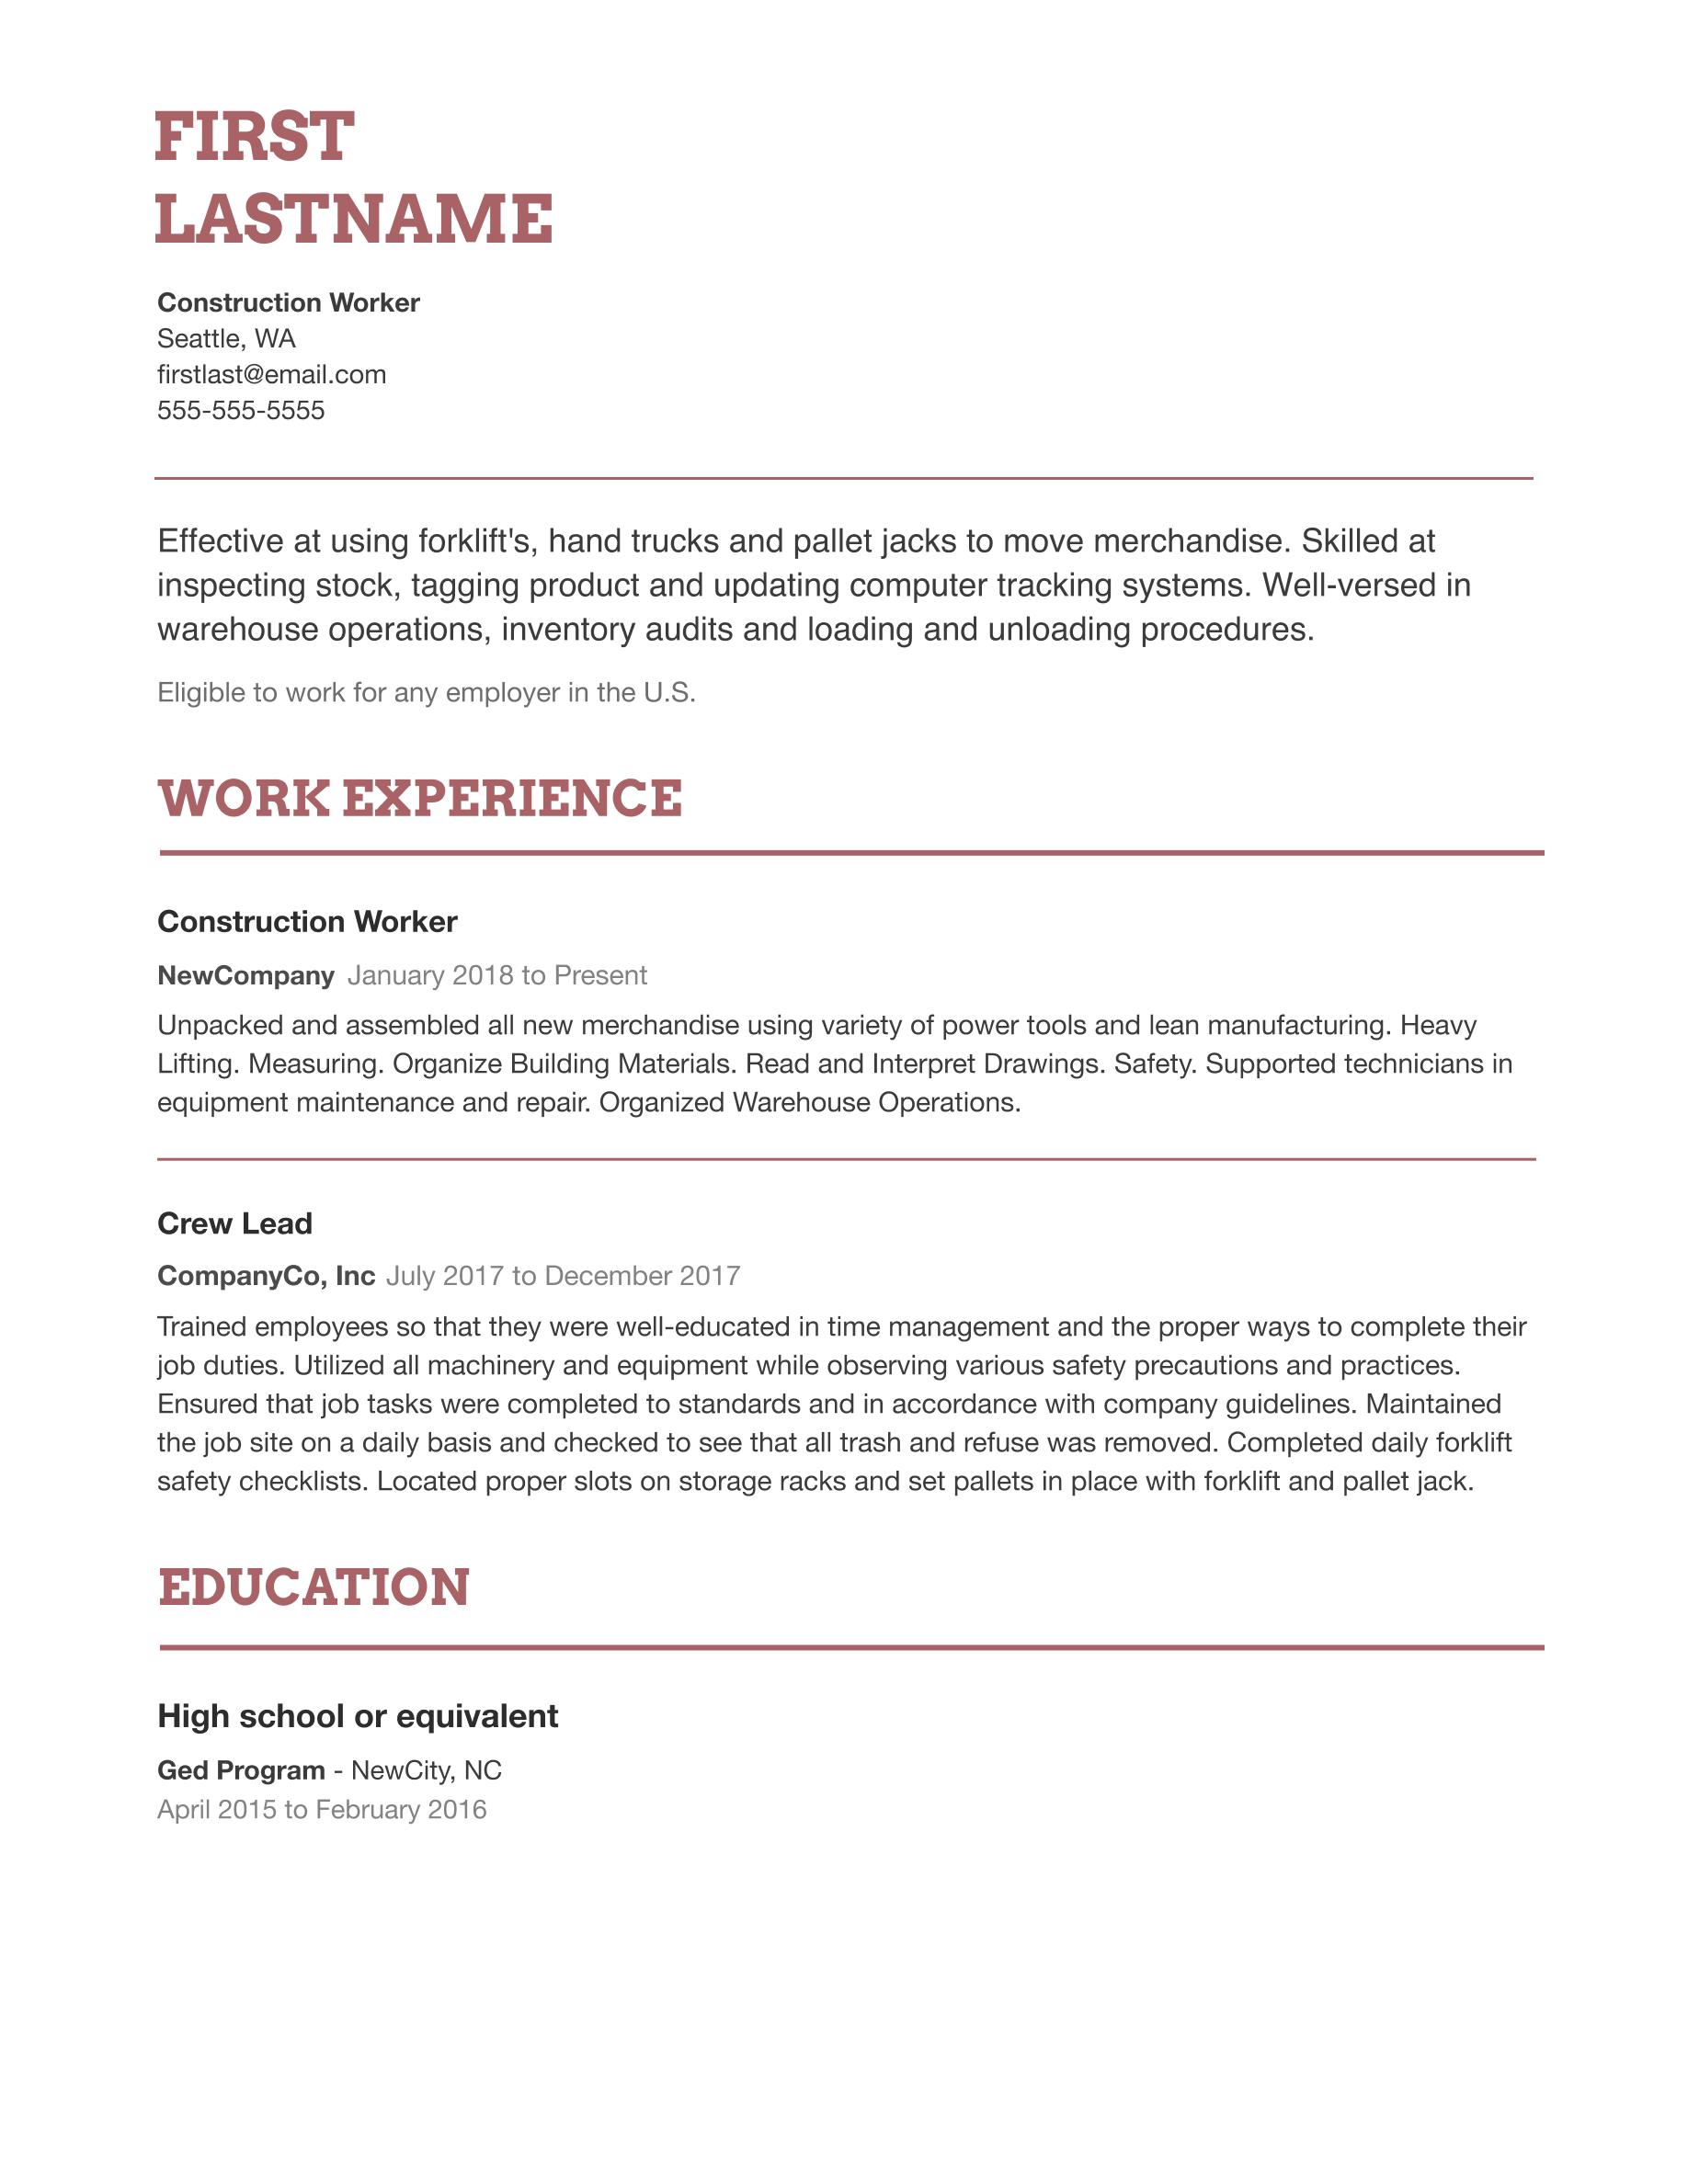 Nuik Noke Professional Resume Templates For Free Resume Templates Nuik Noke Professional Resumes Templates Free Nuik Noke Professional Resume Templat